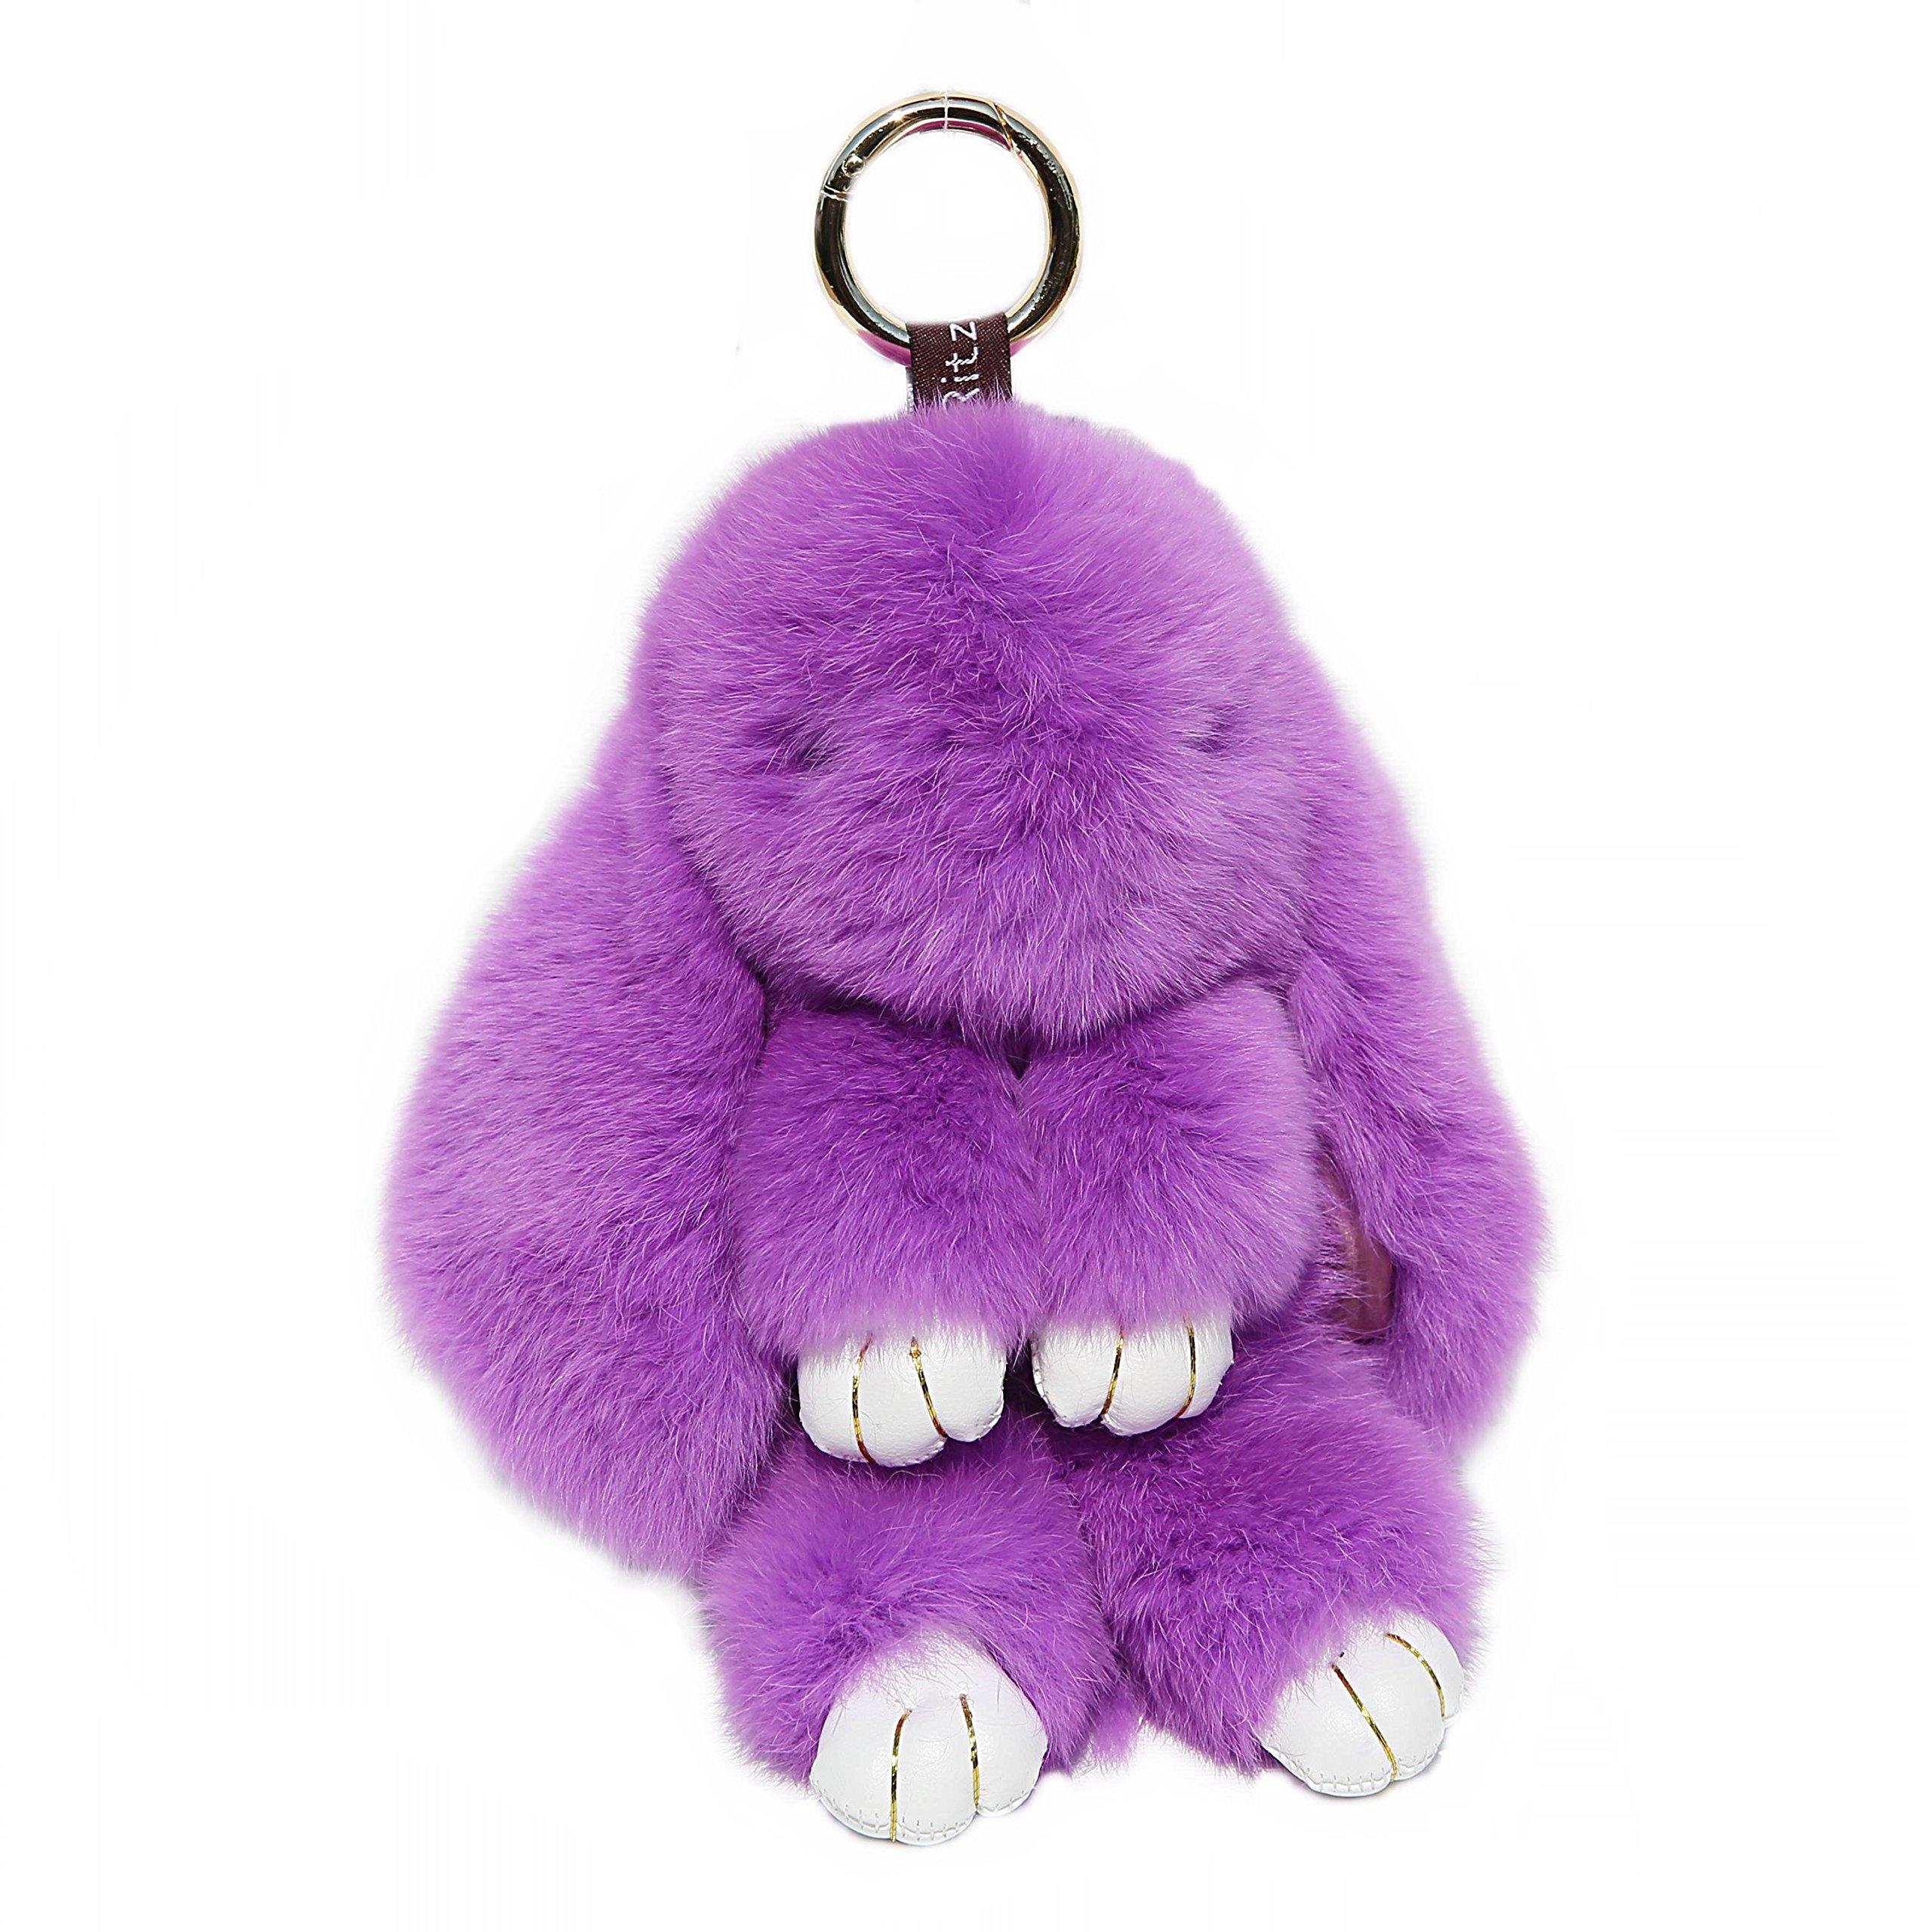 RitzyBay Handmade Rex Rabbit Fur Bunny Keychain with RitzyBay GiftBox (Small, Purple)